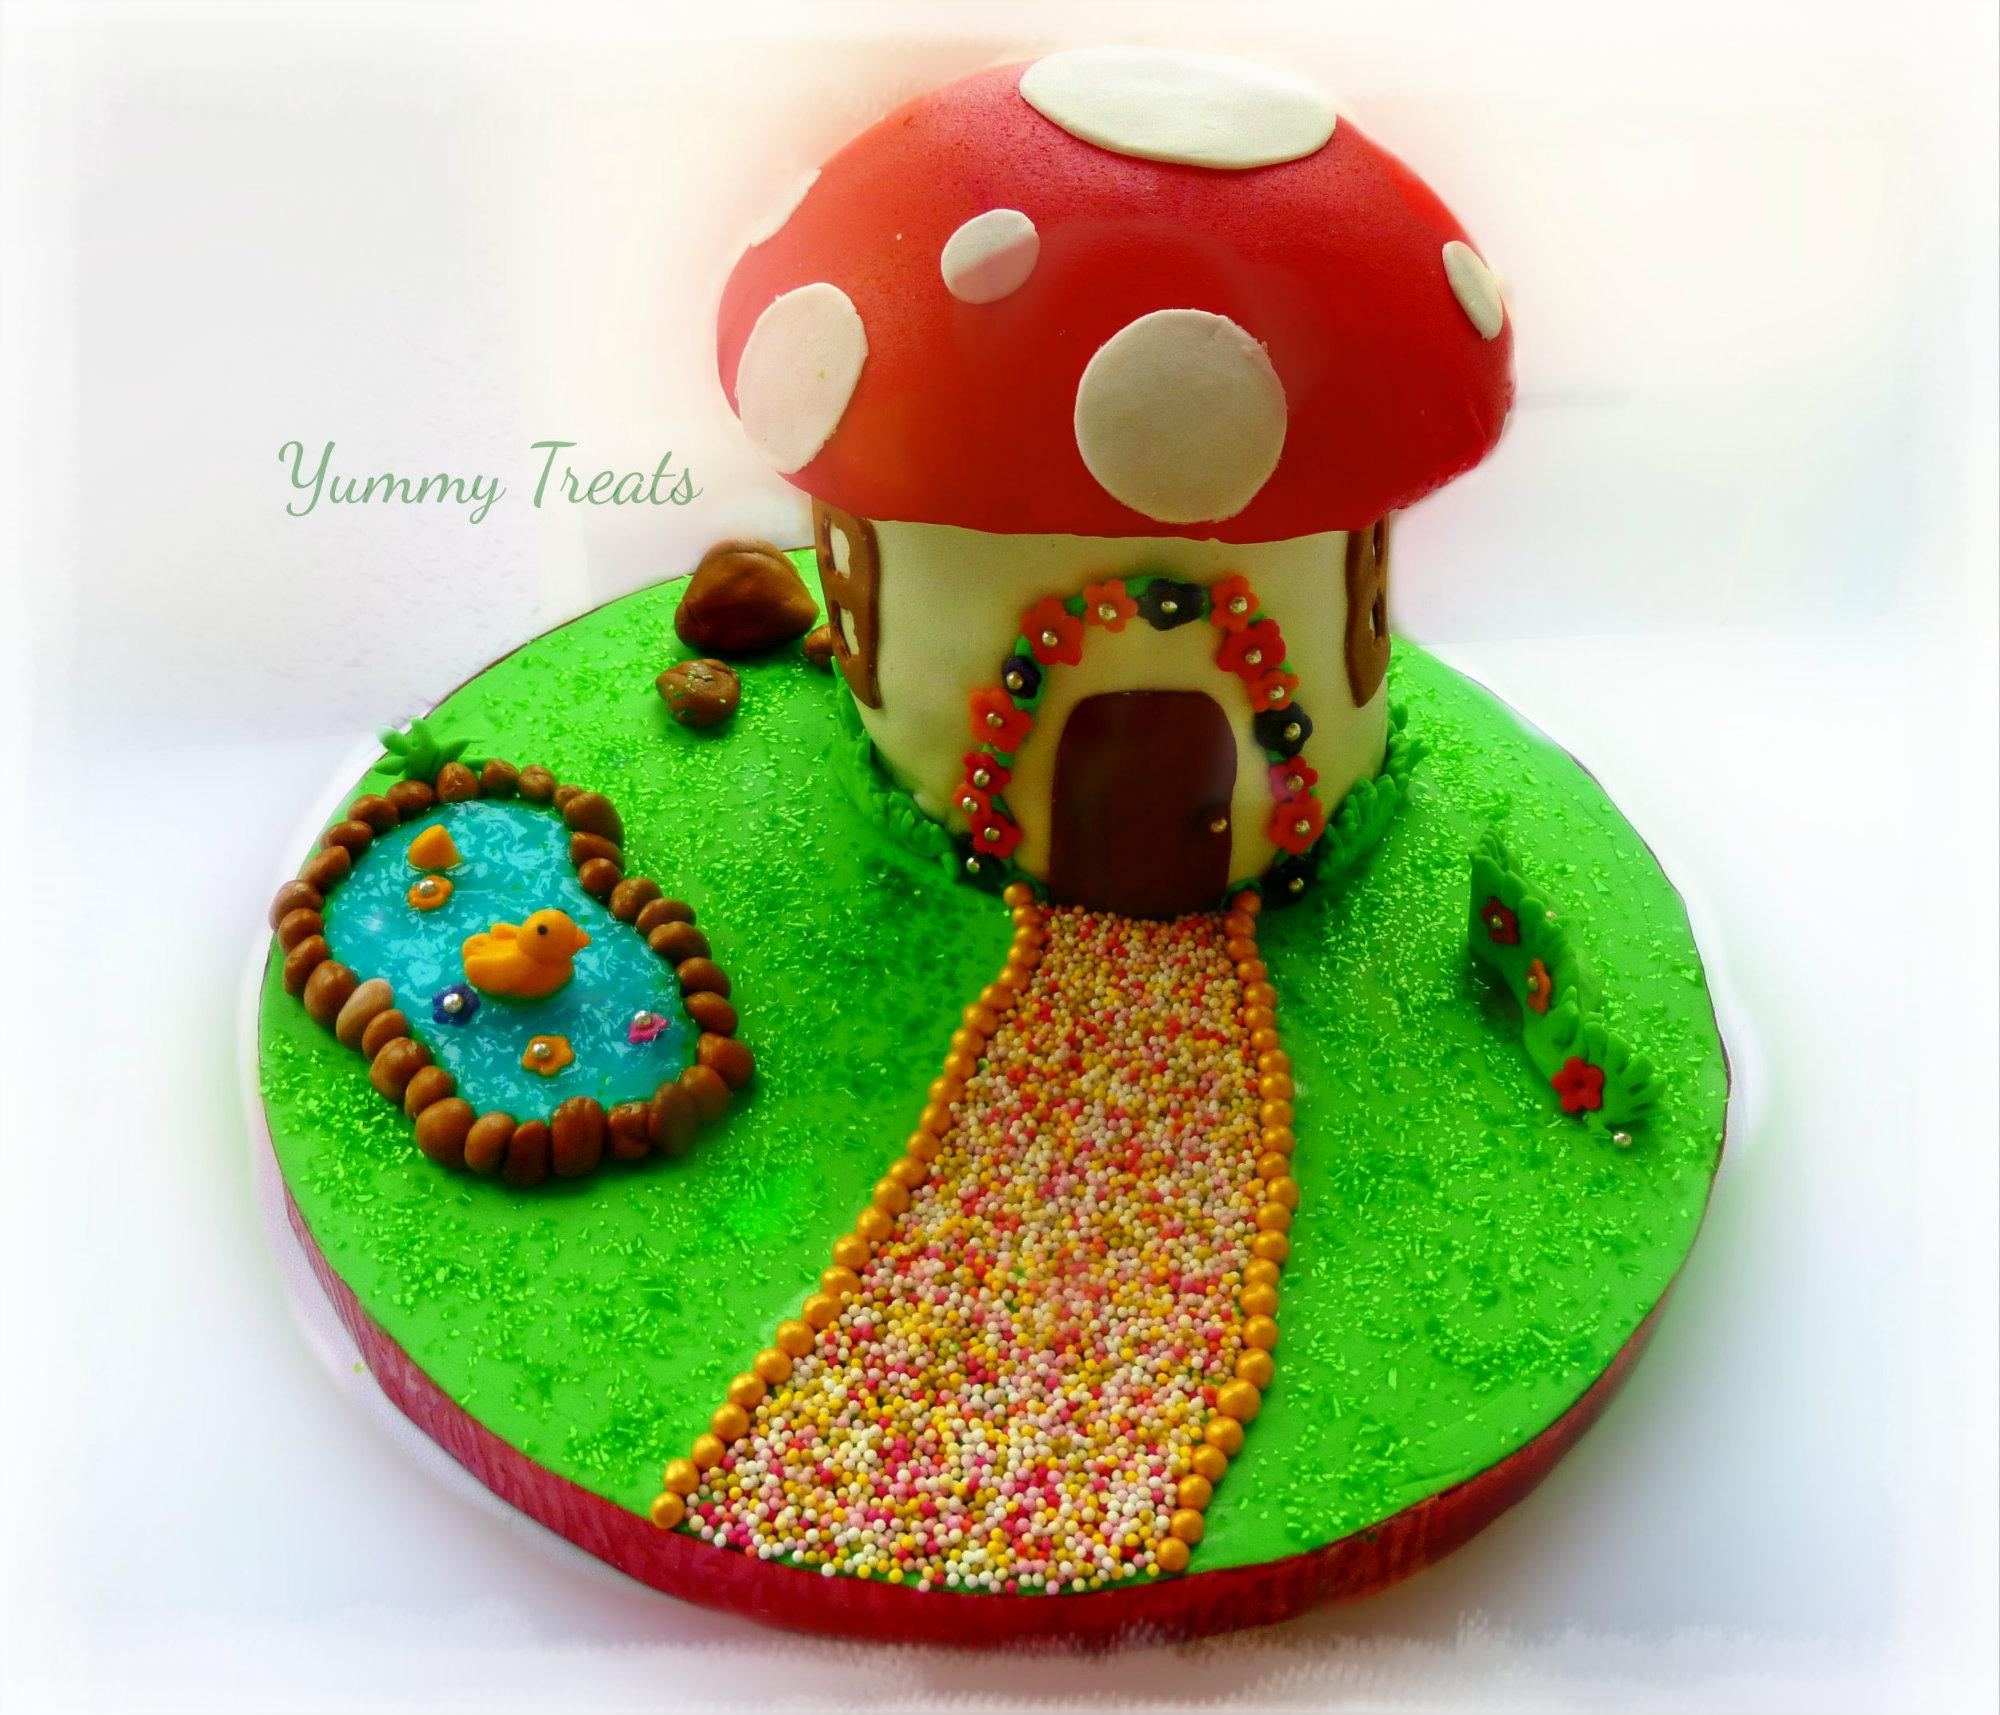 Toadstool / Mushroom Themed Birthday Cake